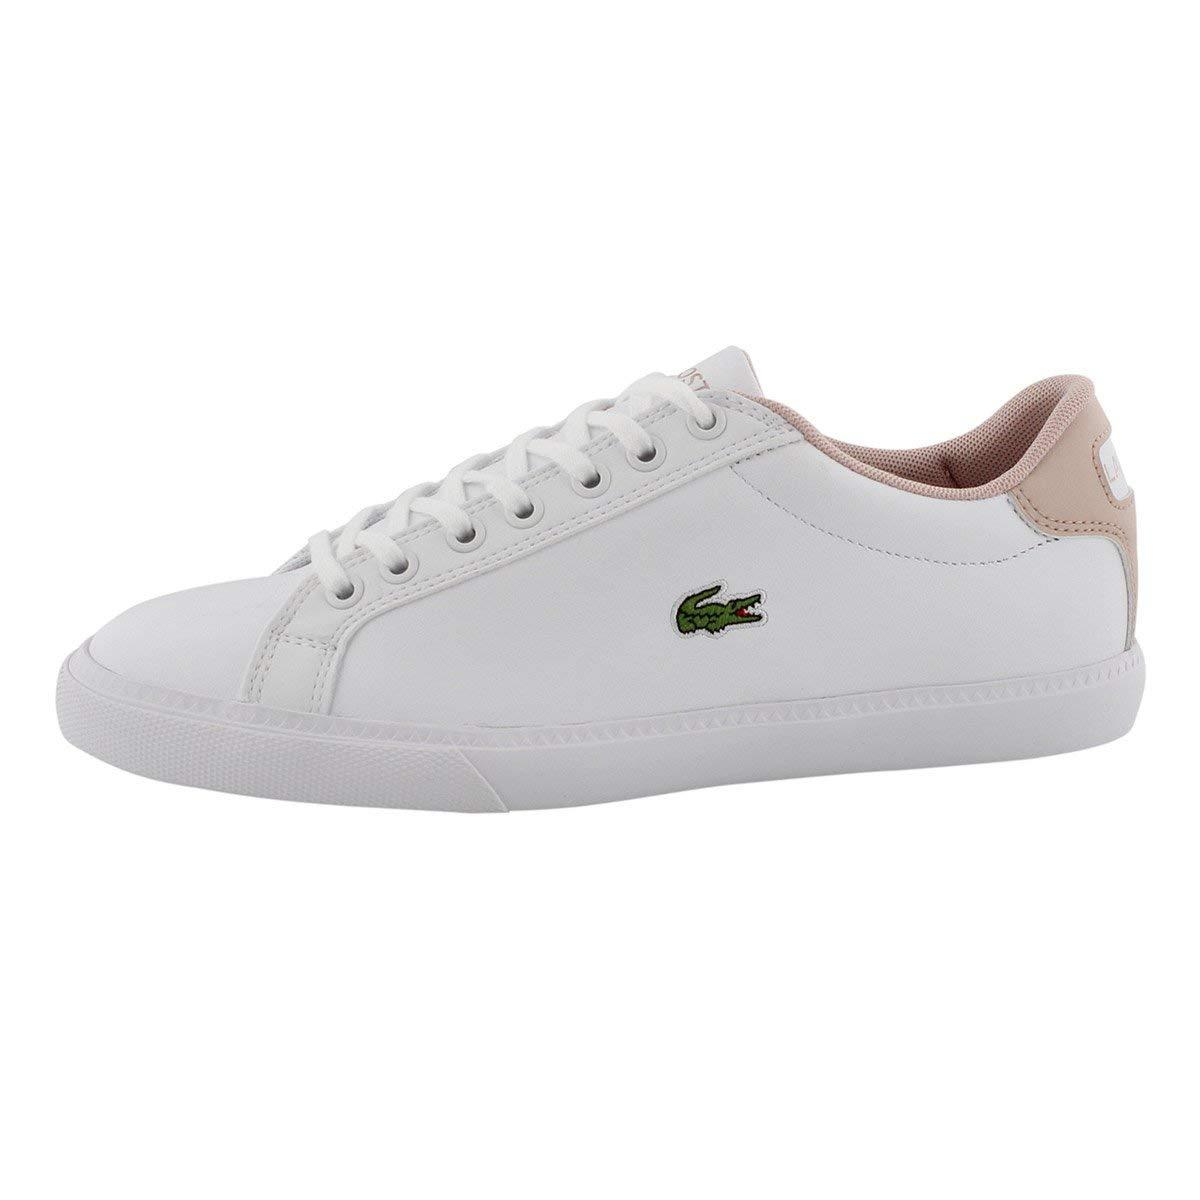 Wht lt pnk Lacoste Women's Grad Vulc 119 2 P Fashion Sneaker